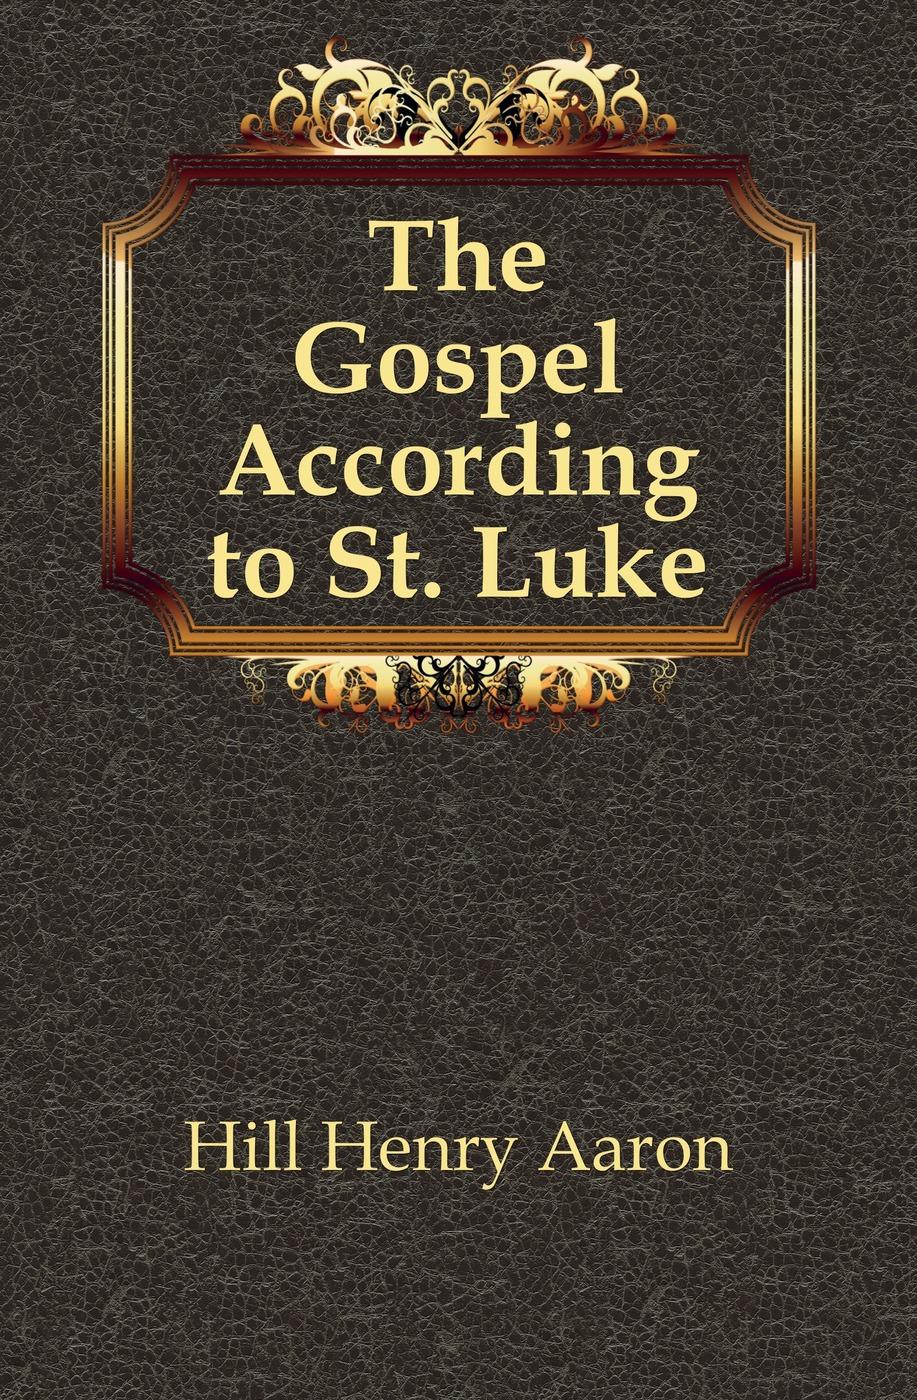 Hill Henry Aaron The Gospel According to St. Luke aaron hill merope